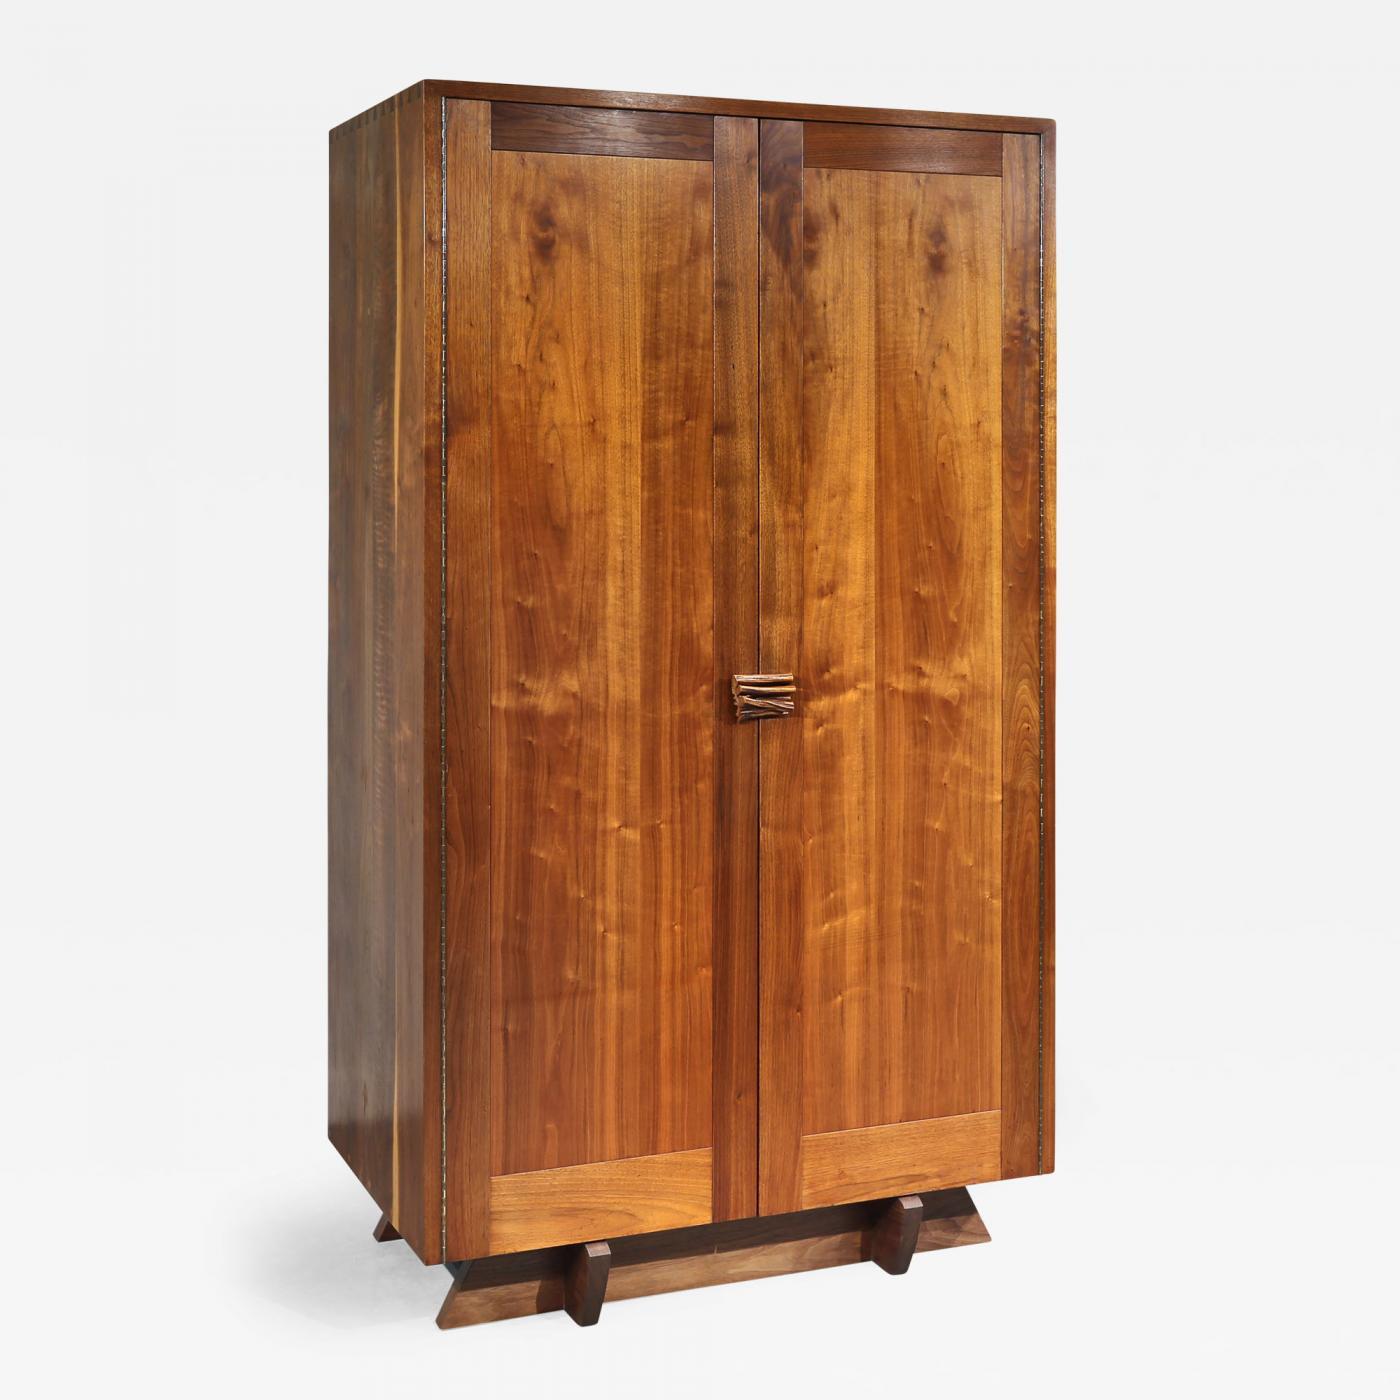 Listings / Furniture / Case Pieces U0026 Storage / Armoires   Wardrobes ·  George Nakashima Unique Custom ...